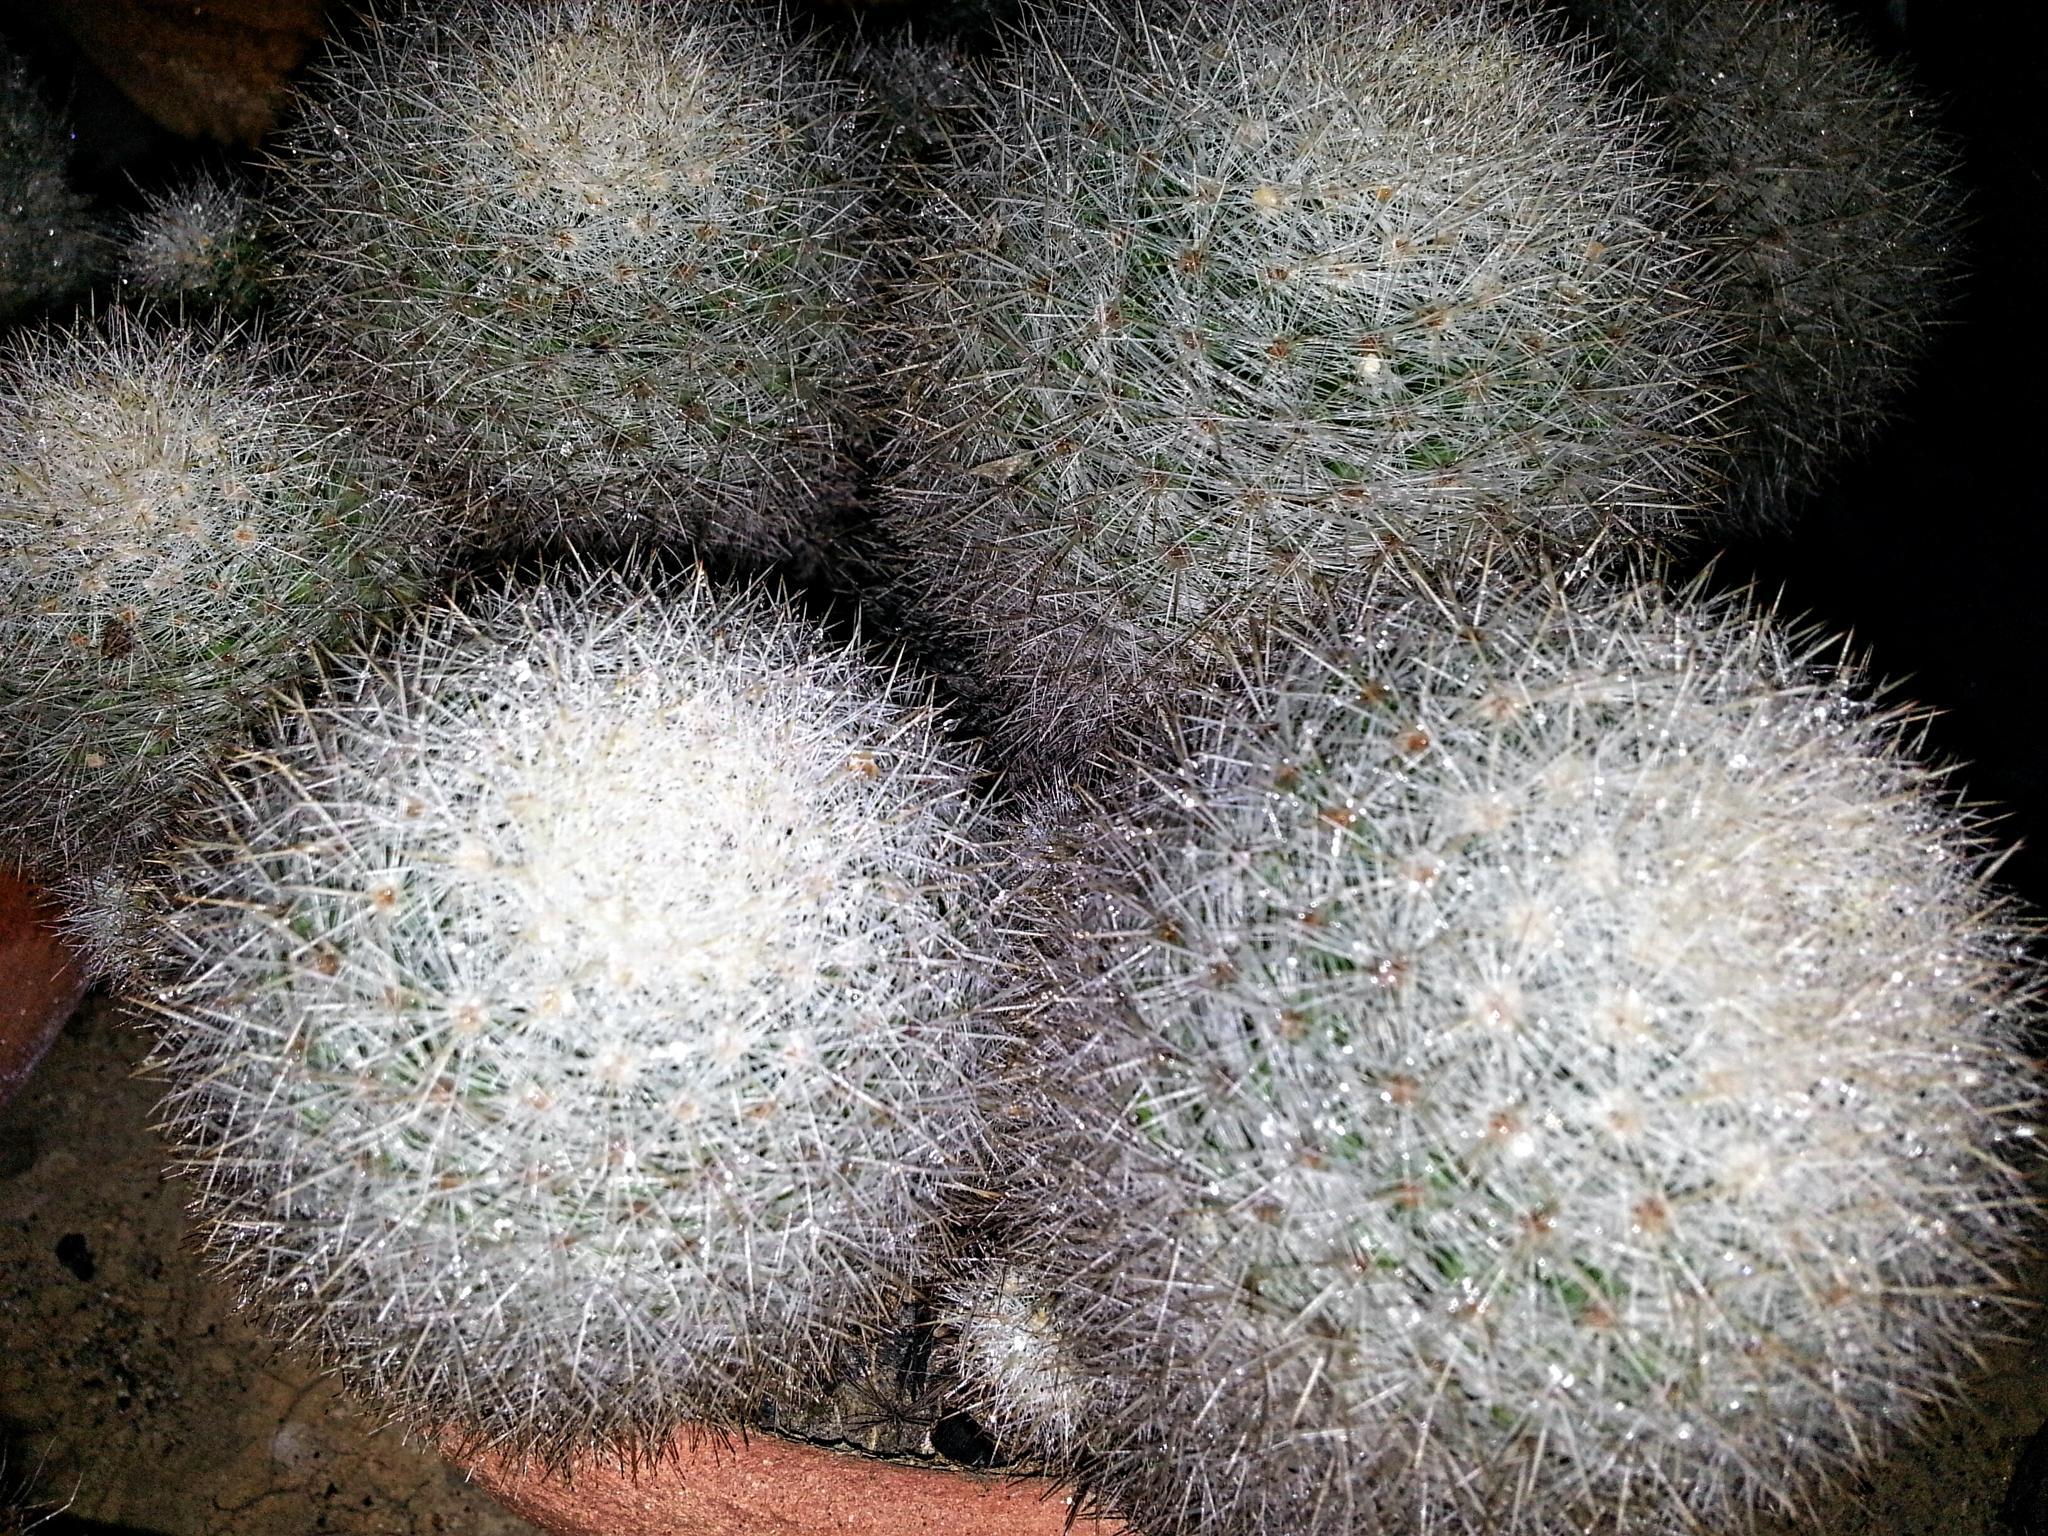 My cactus by jaraswong